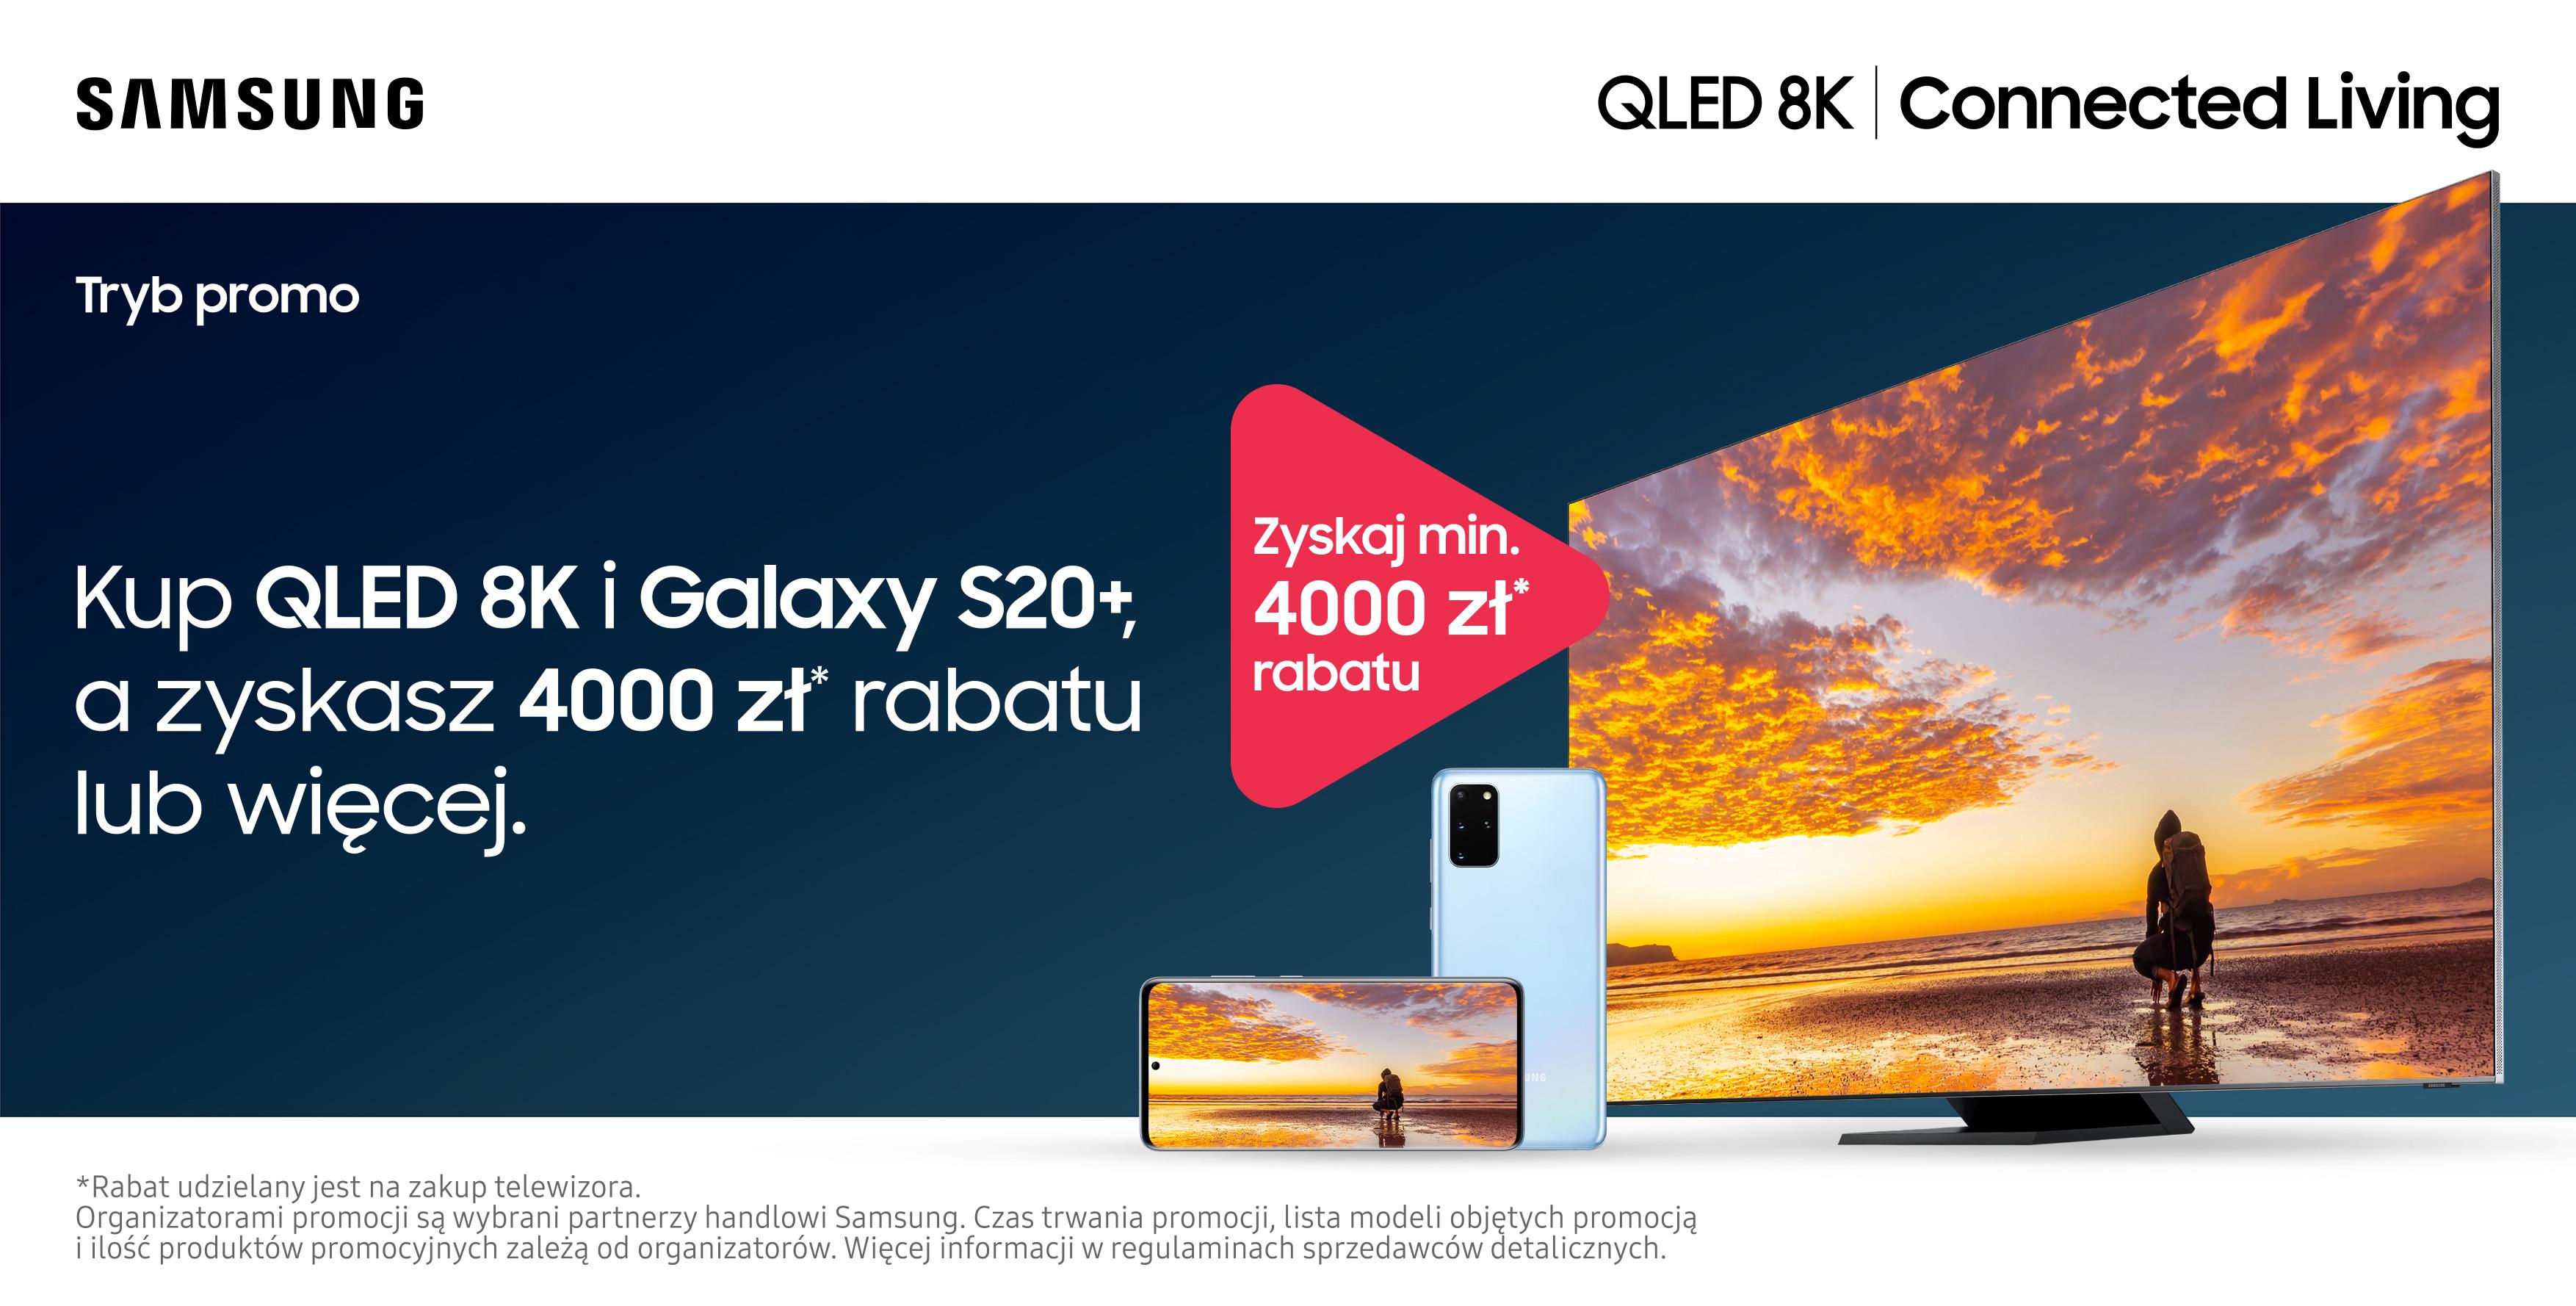 Startuje promocja na telewizor QLED 8K i smartfon Galaxy S20+